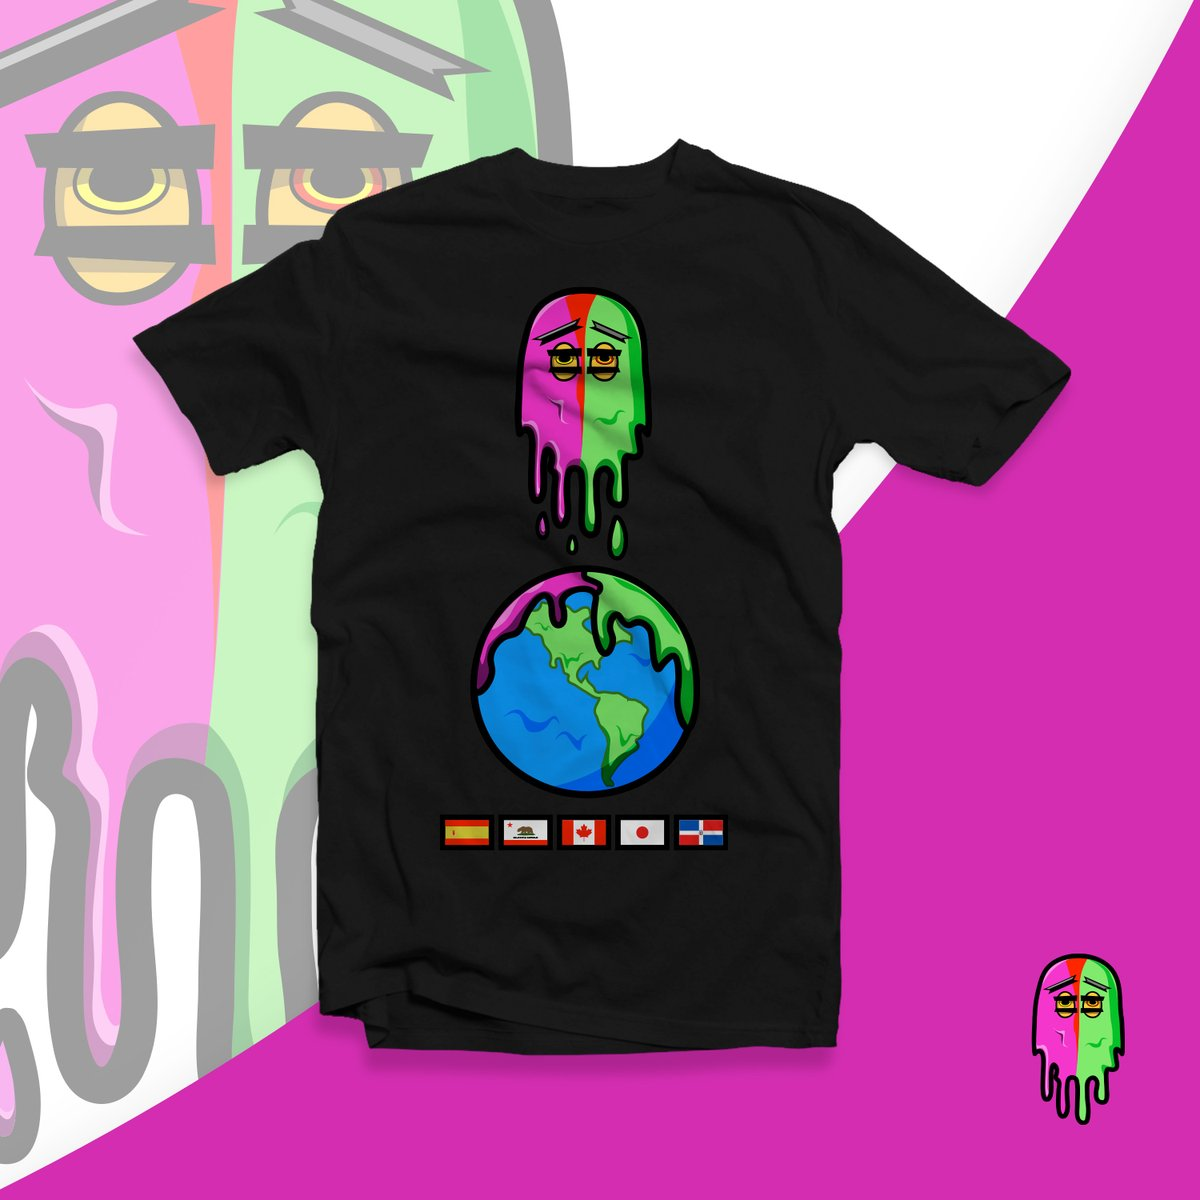 Shirt design for @k1ng_b0b - https://t.co/aXg9tdAk9O  #shirtdesign #printdesign #graphicdesign #print #basketball #printdesign #illustrator #merchdesign #teeshirts #printdesigns #shirtdesigner #shirtdesigns #ghost #worldwide #vectormascot https://t.co/wdBBpR0cai